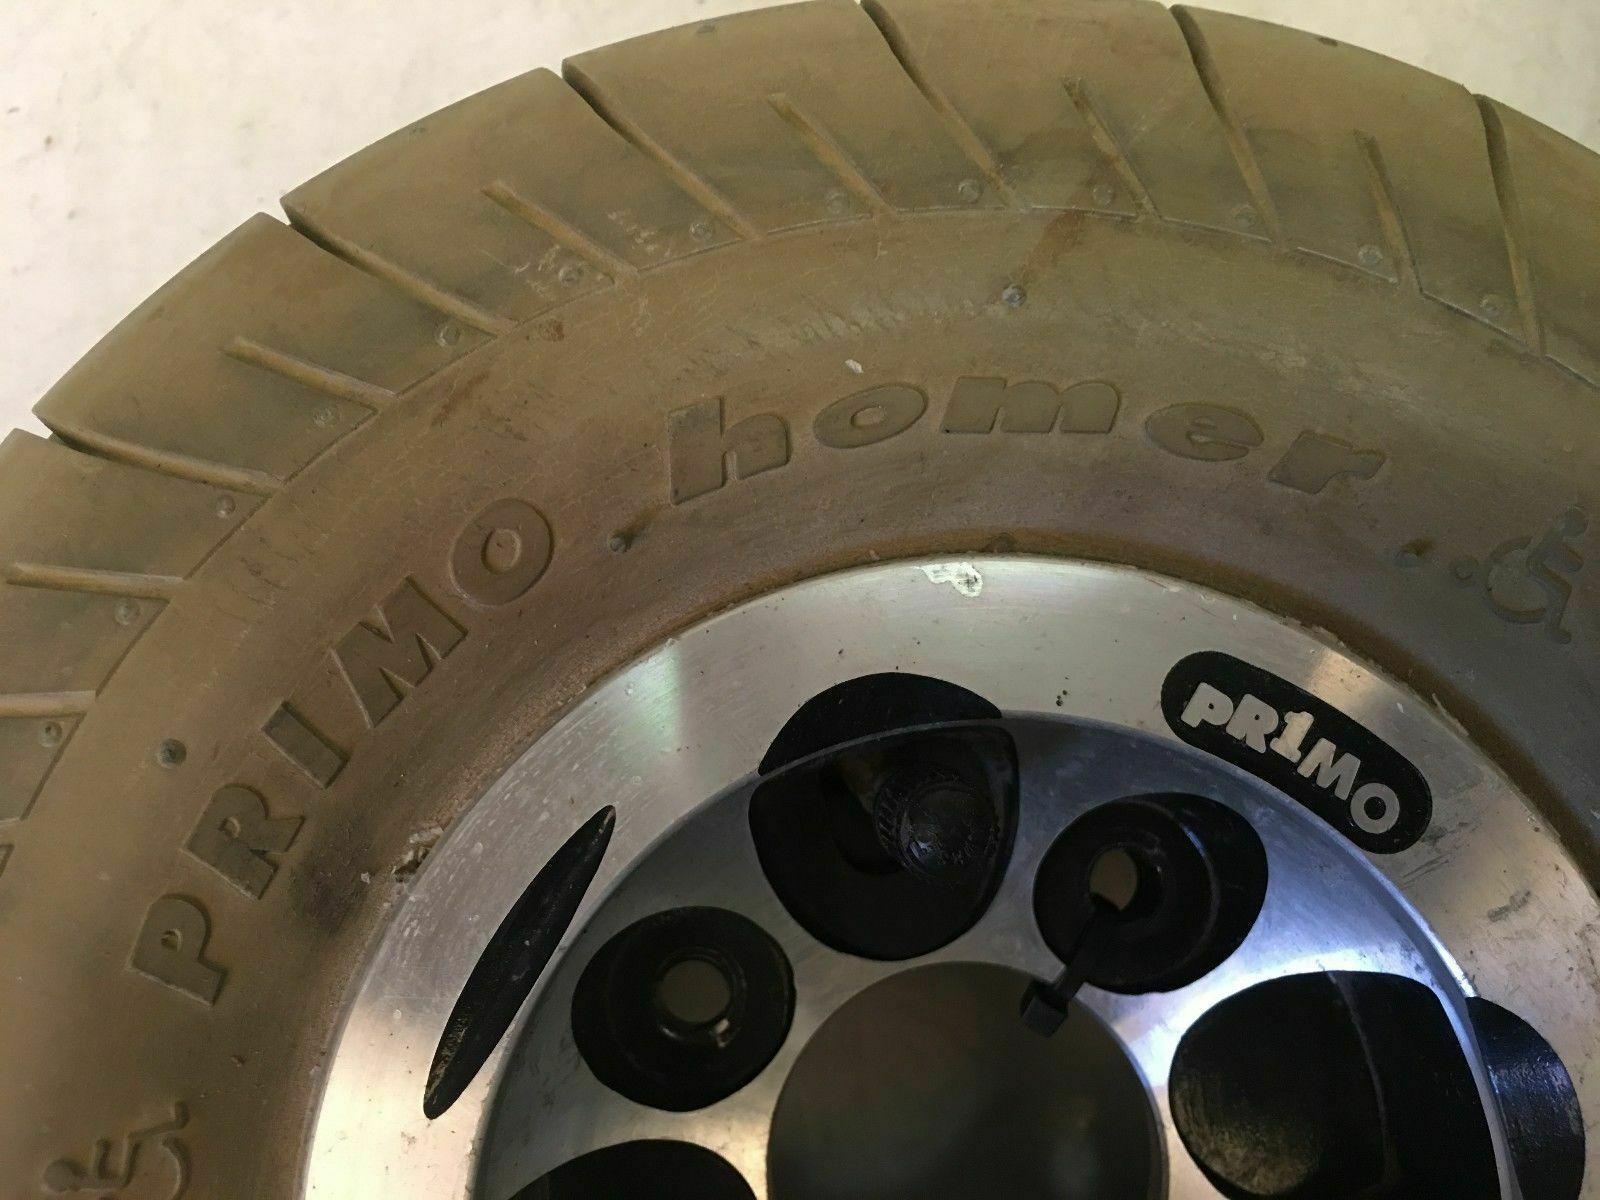 Rascal 250 PC - Pr1mo Homer Drive Wheels - For Power Wheelchairs image 2